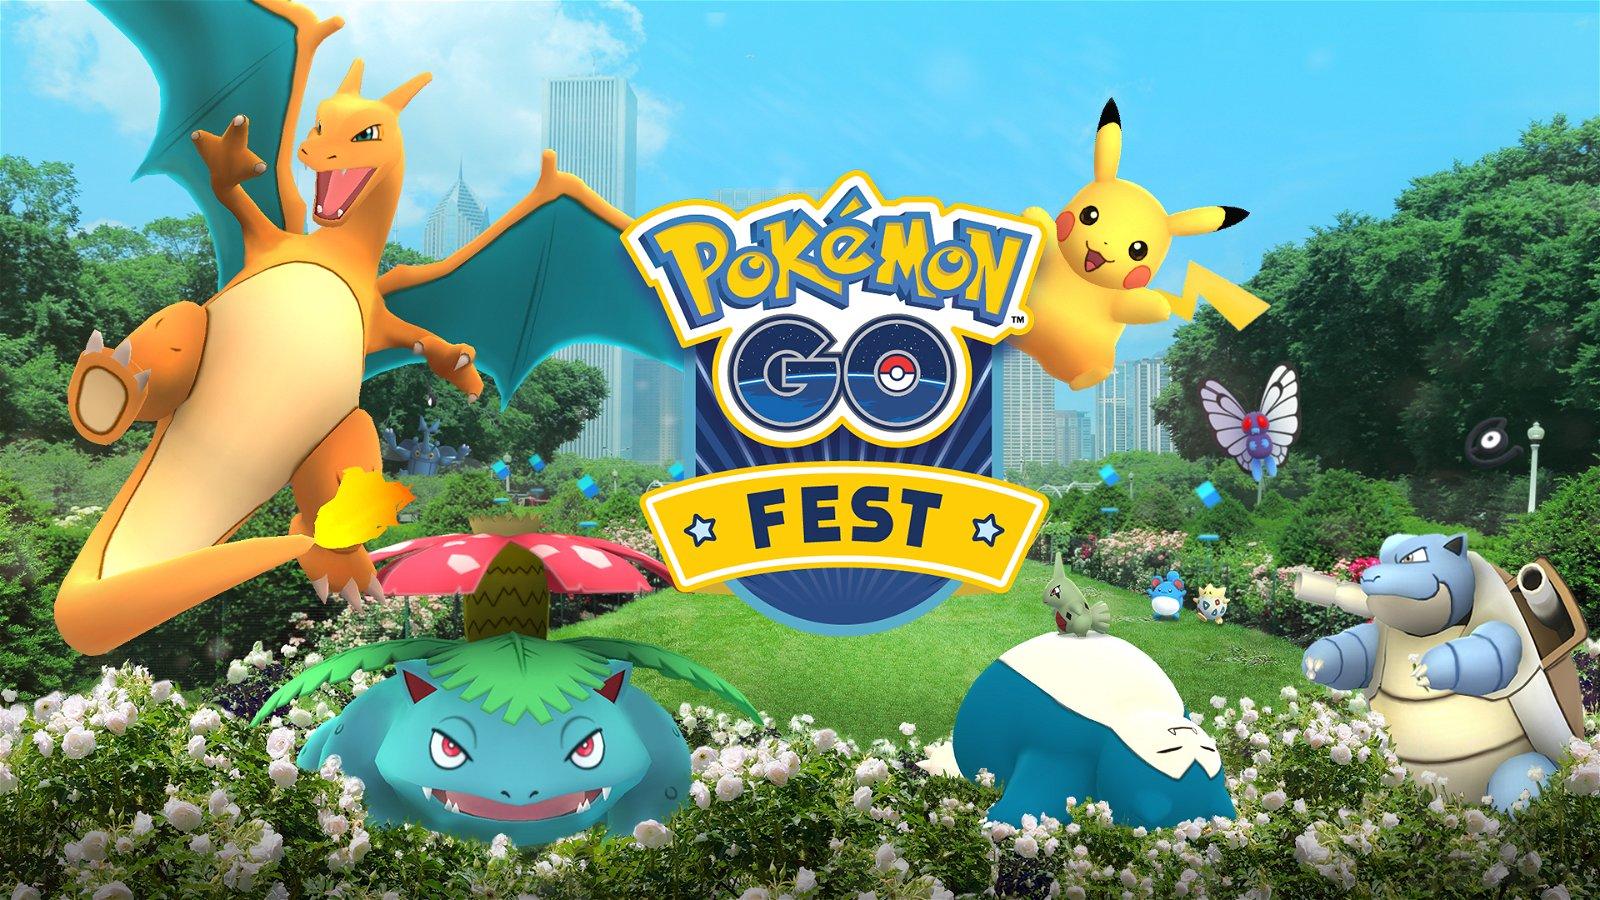 Pokémon Go Fest Saved Thanks To Early Release Of Legendary Pokémon 2